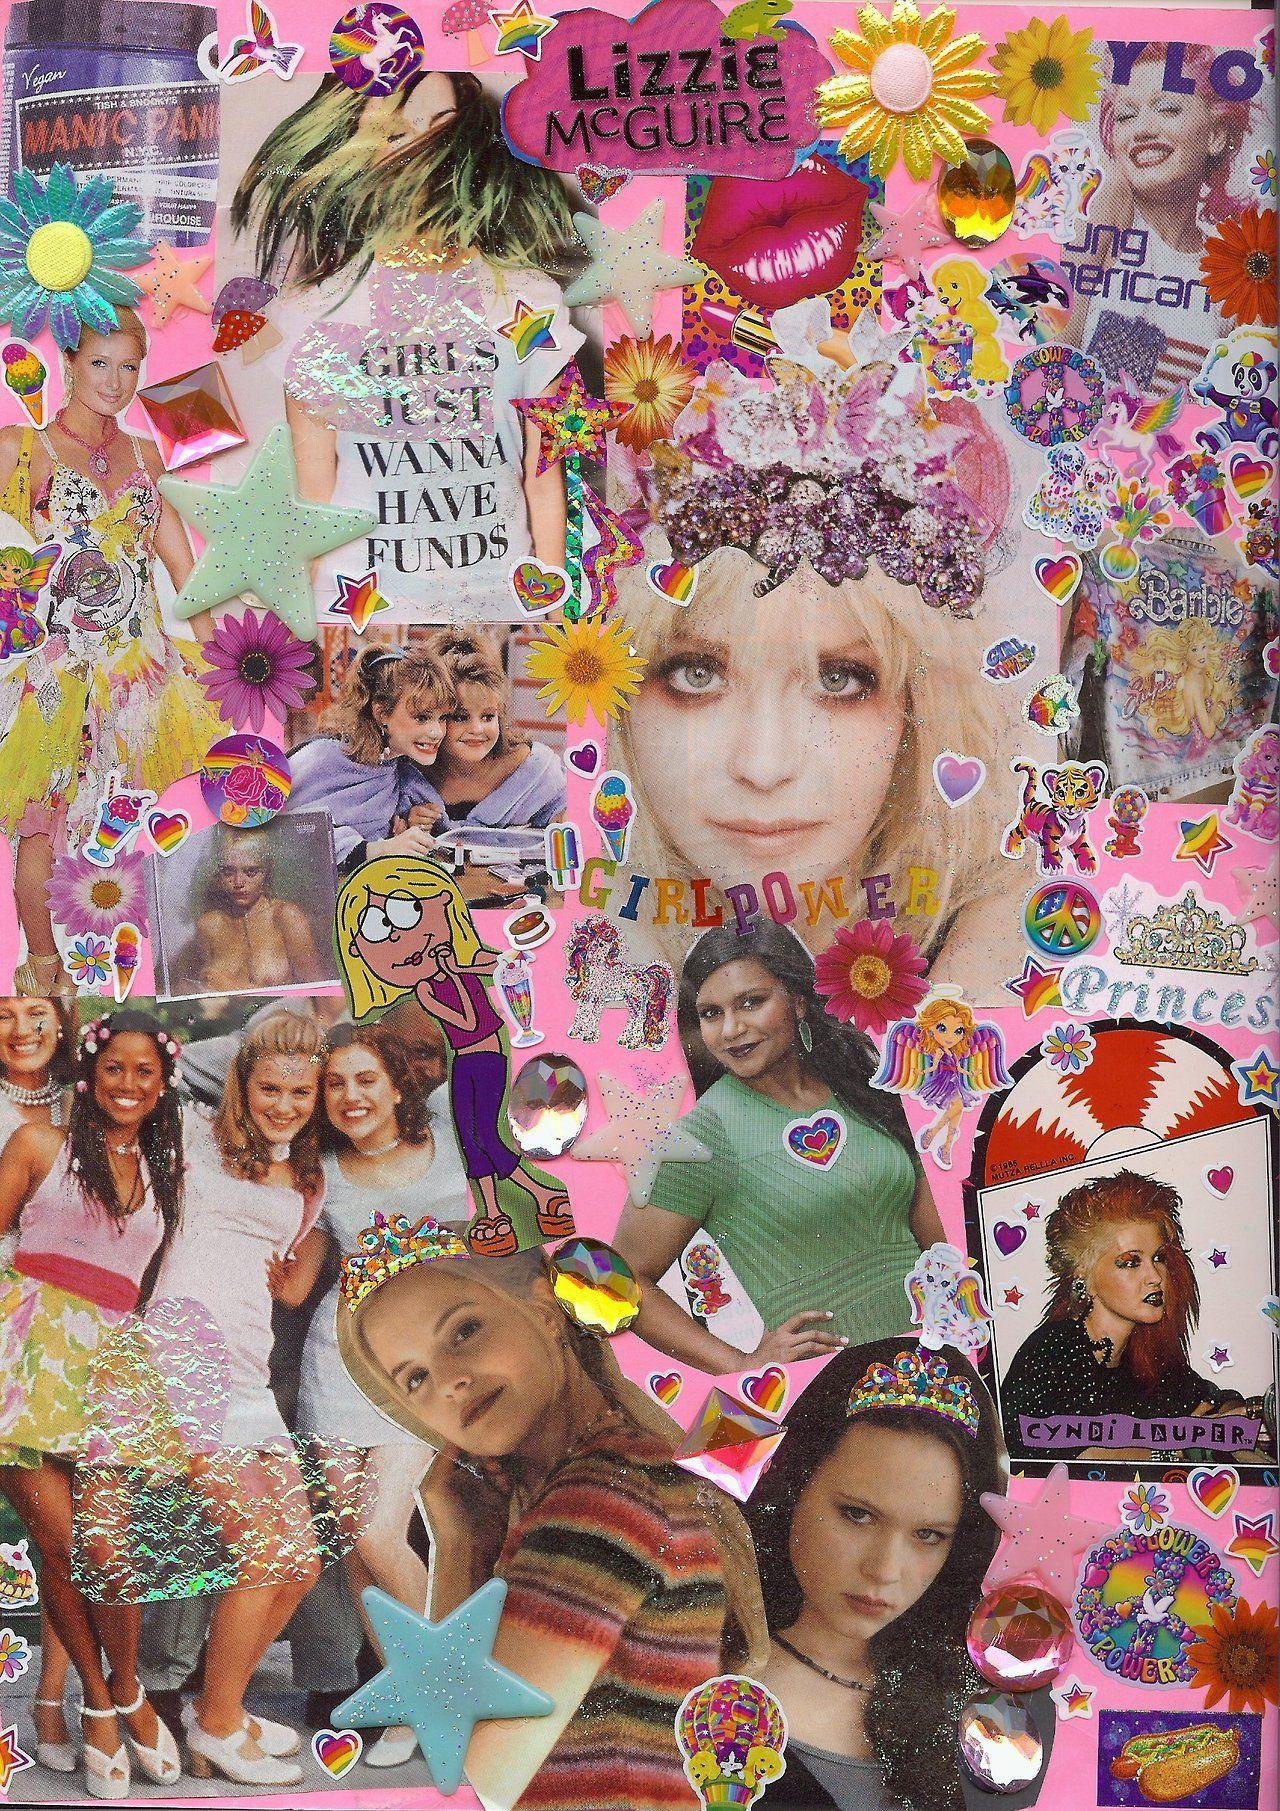 🖤 90s Wallpaper Aesthetic Pink - 2021